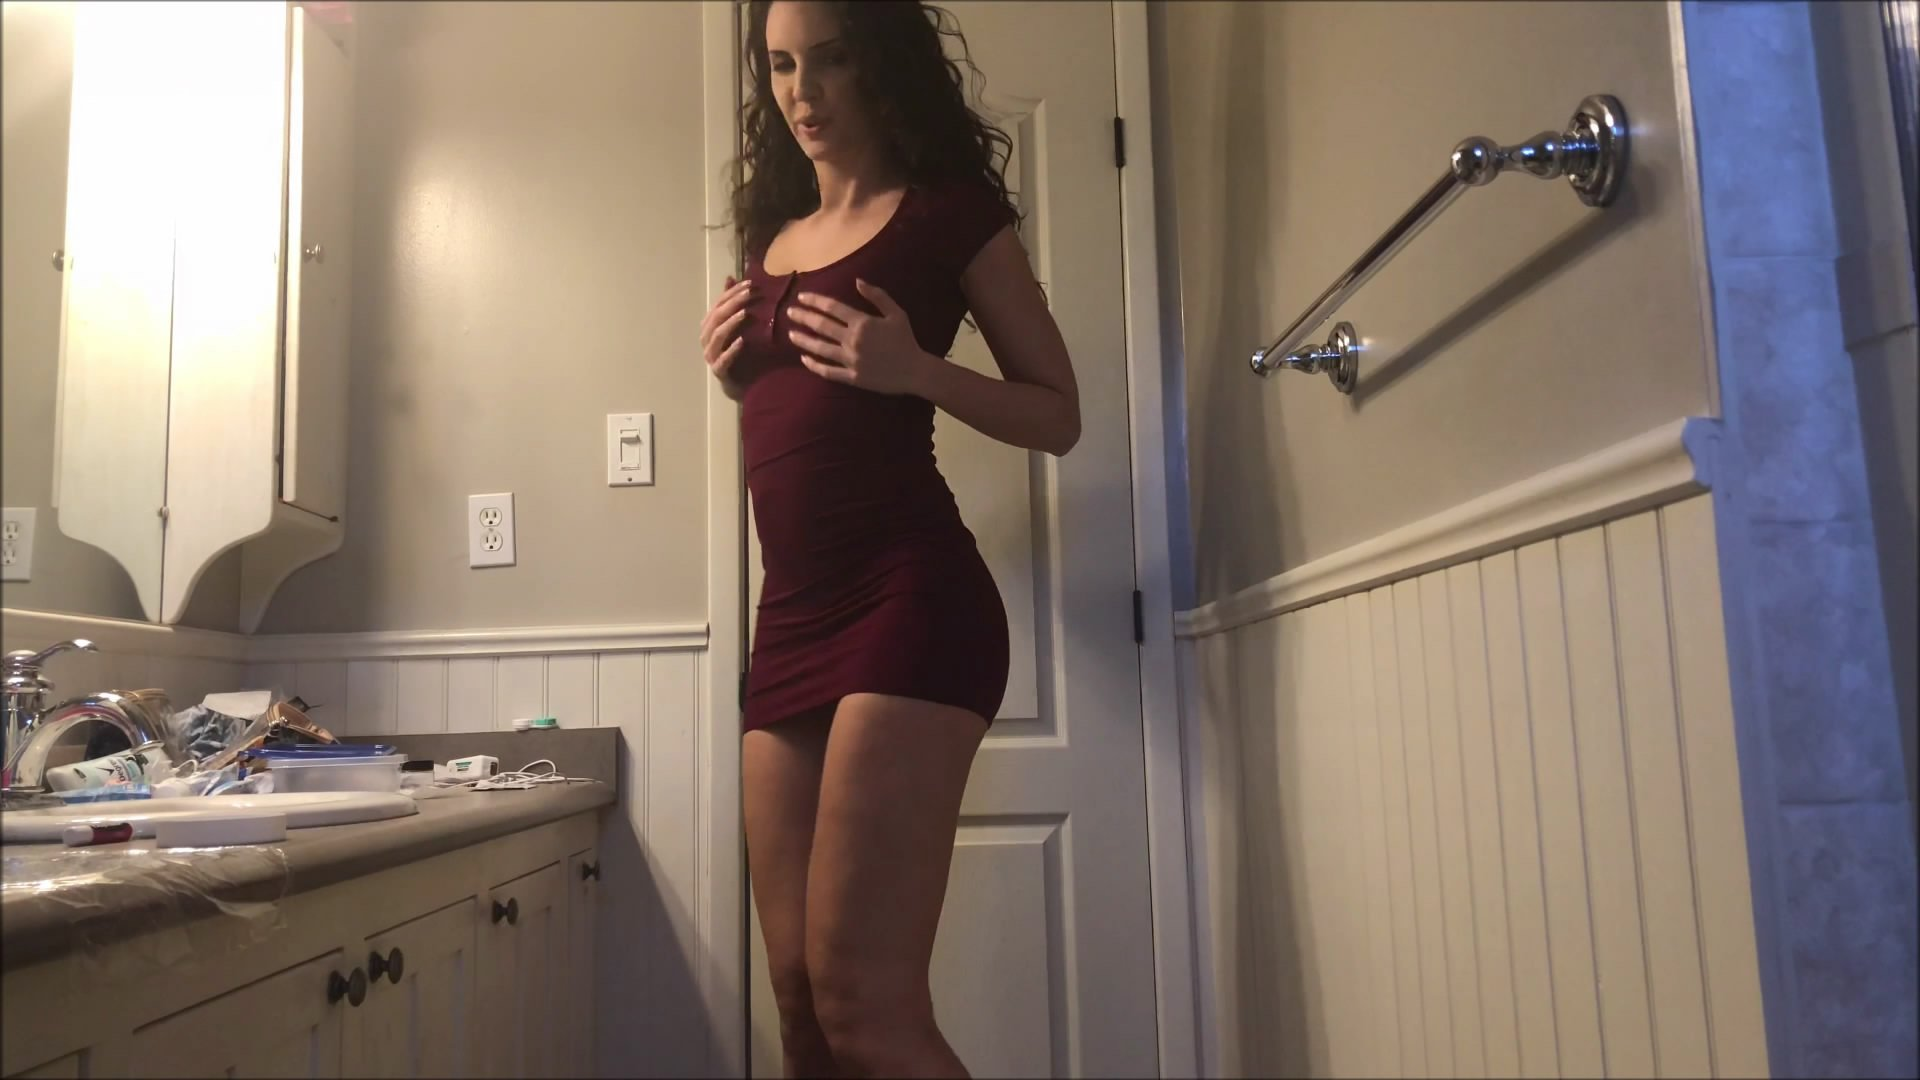 Burgundy dress bumplug starring in video TinaAmazon ($15.99 ScatShop) – Efro